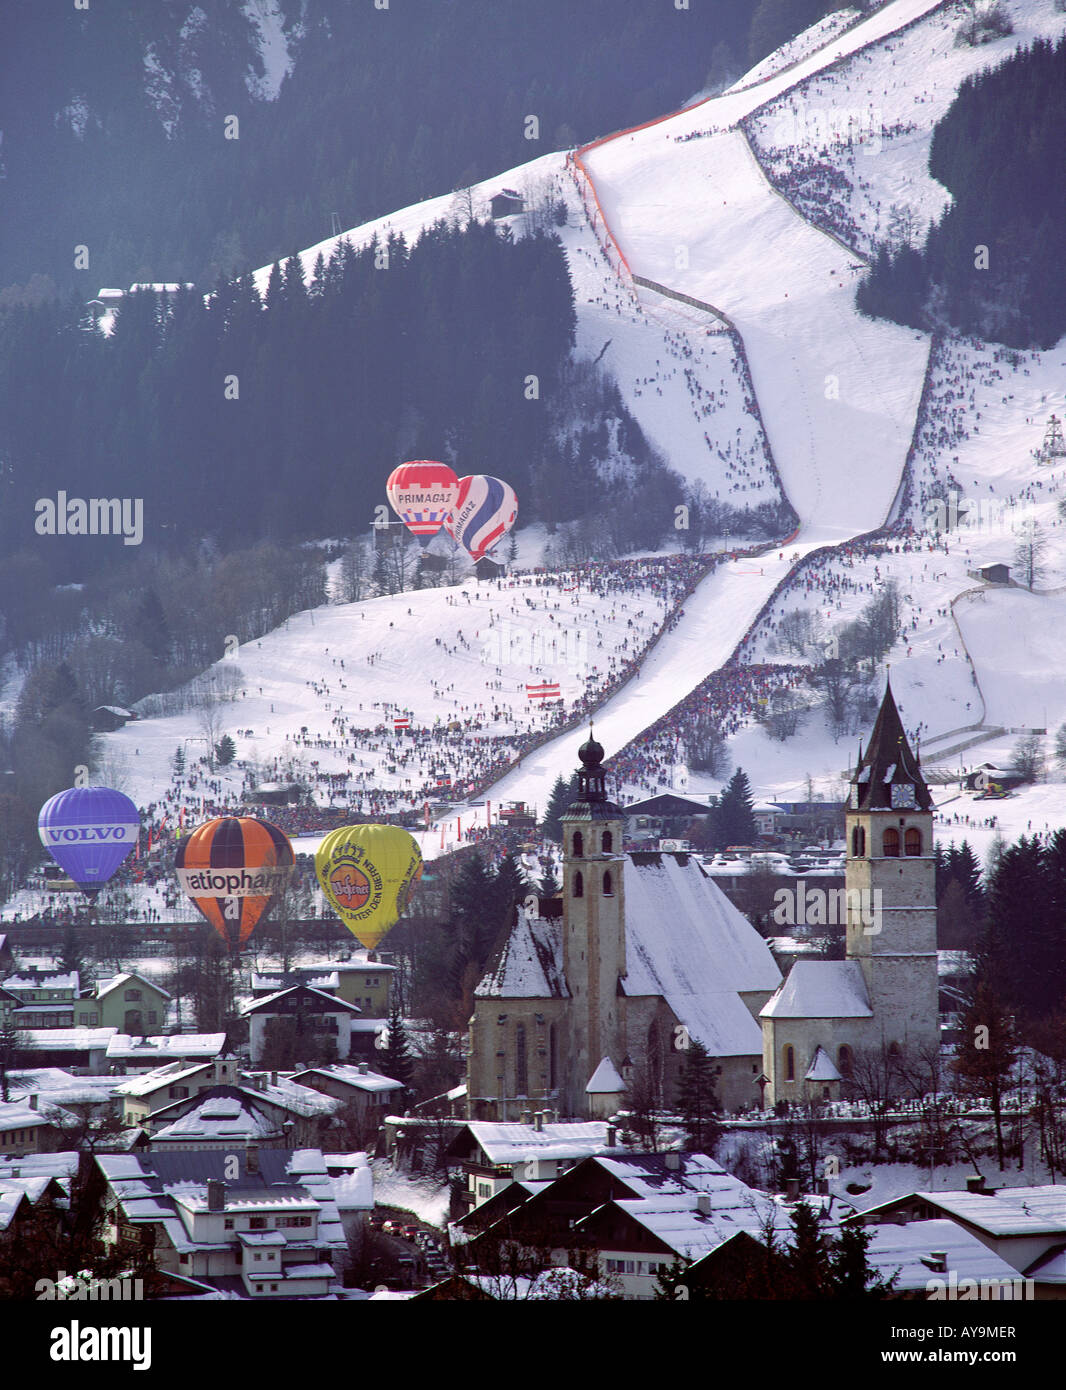 DOWNHILL SKIING COMPETITION KITZBUEHEL, AUSTRIA - Stock Image